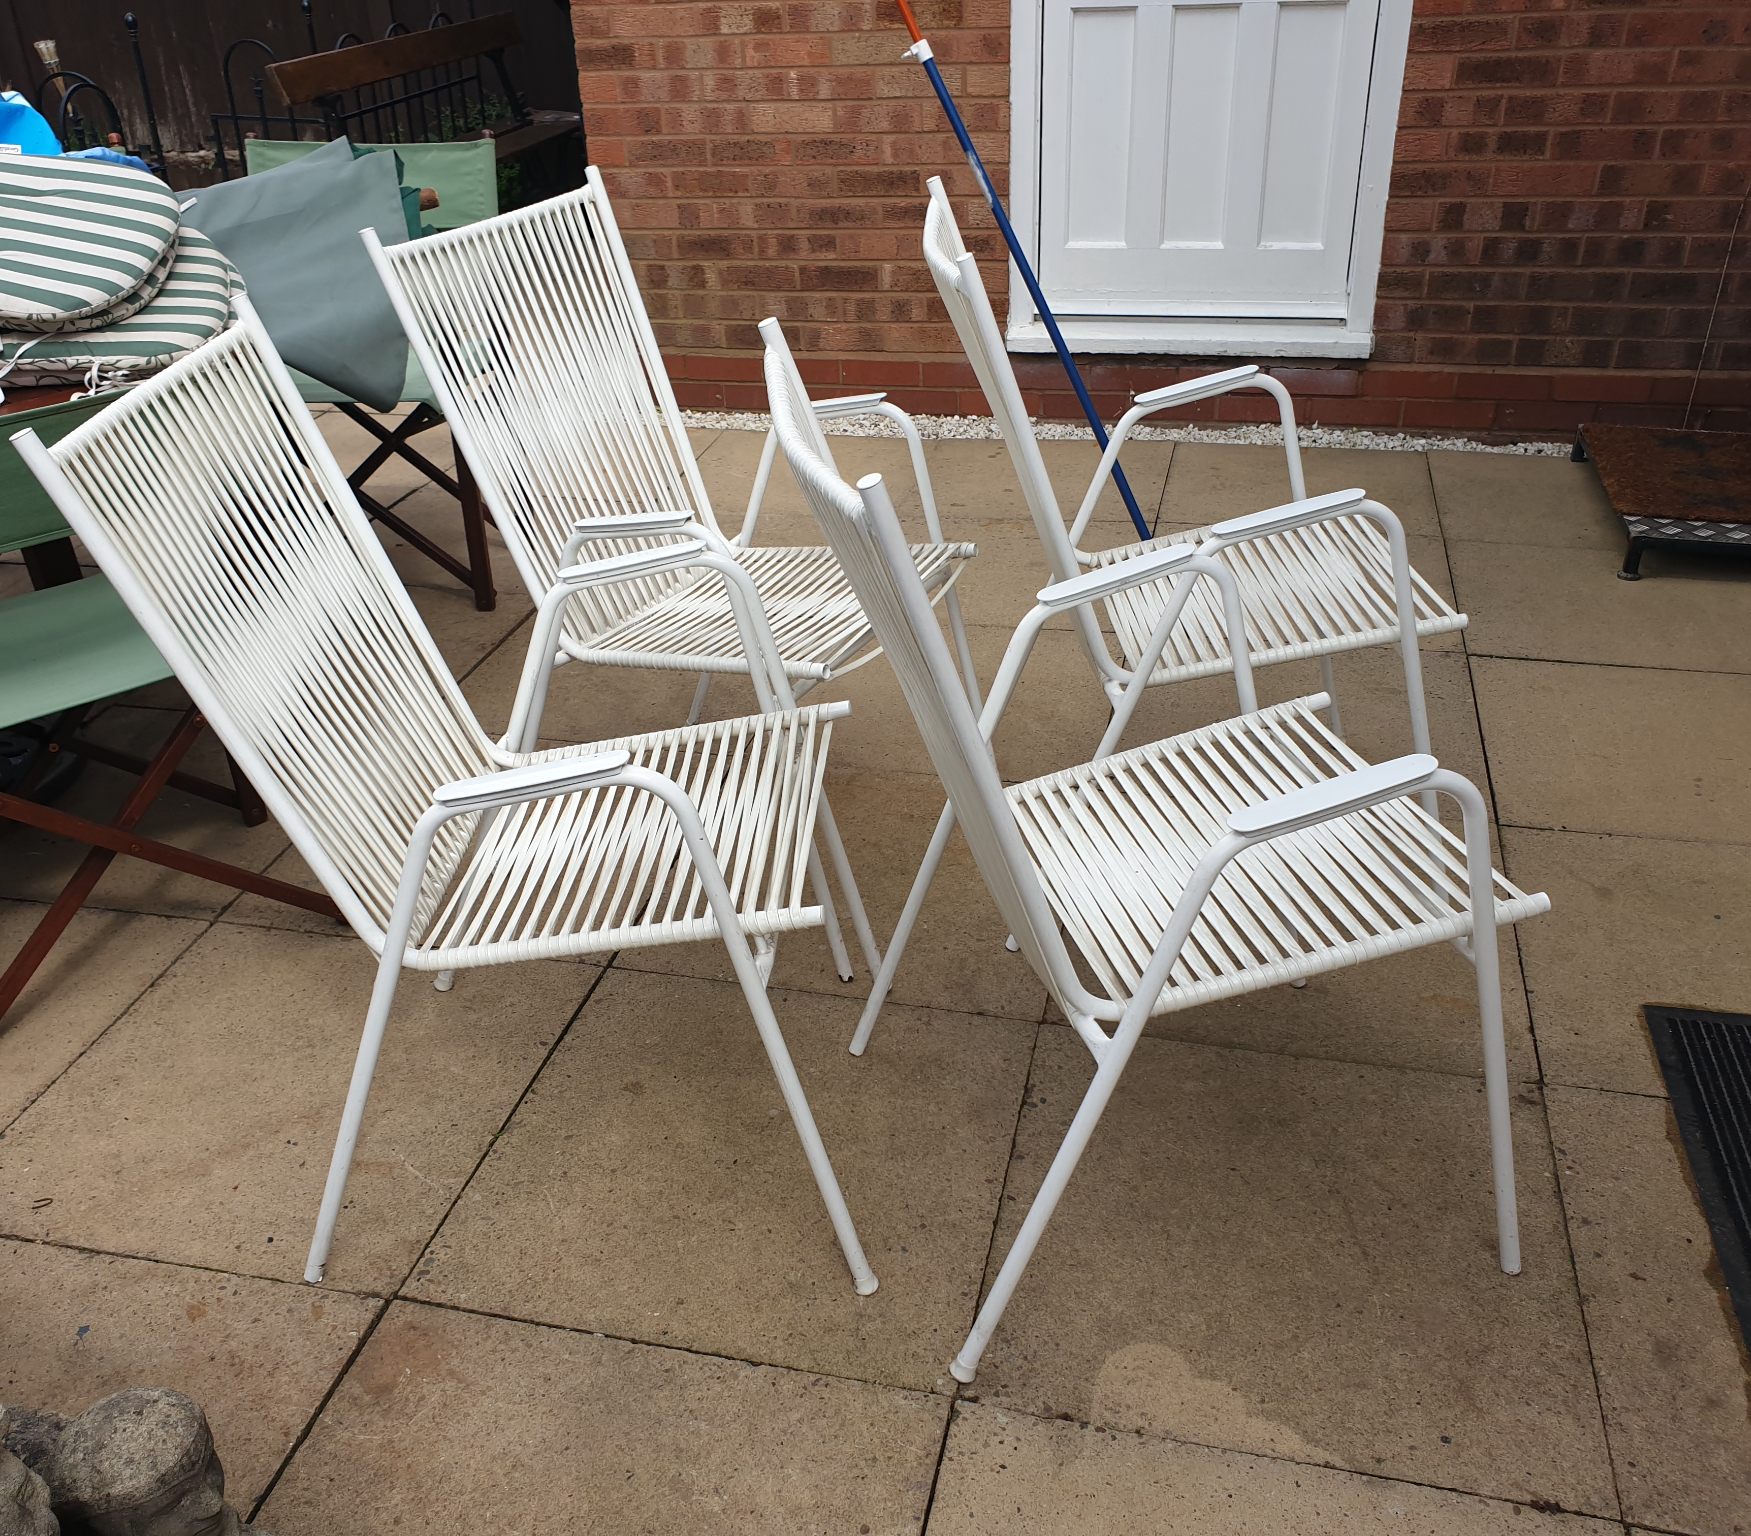 Mid Century Danish Patio Lawn Chairs x 4 off